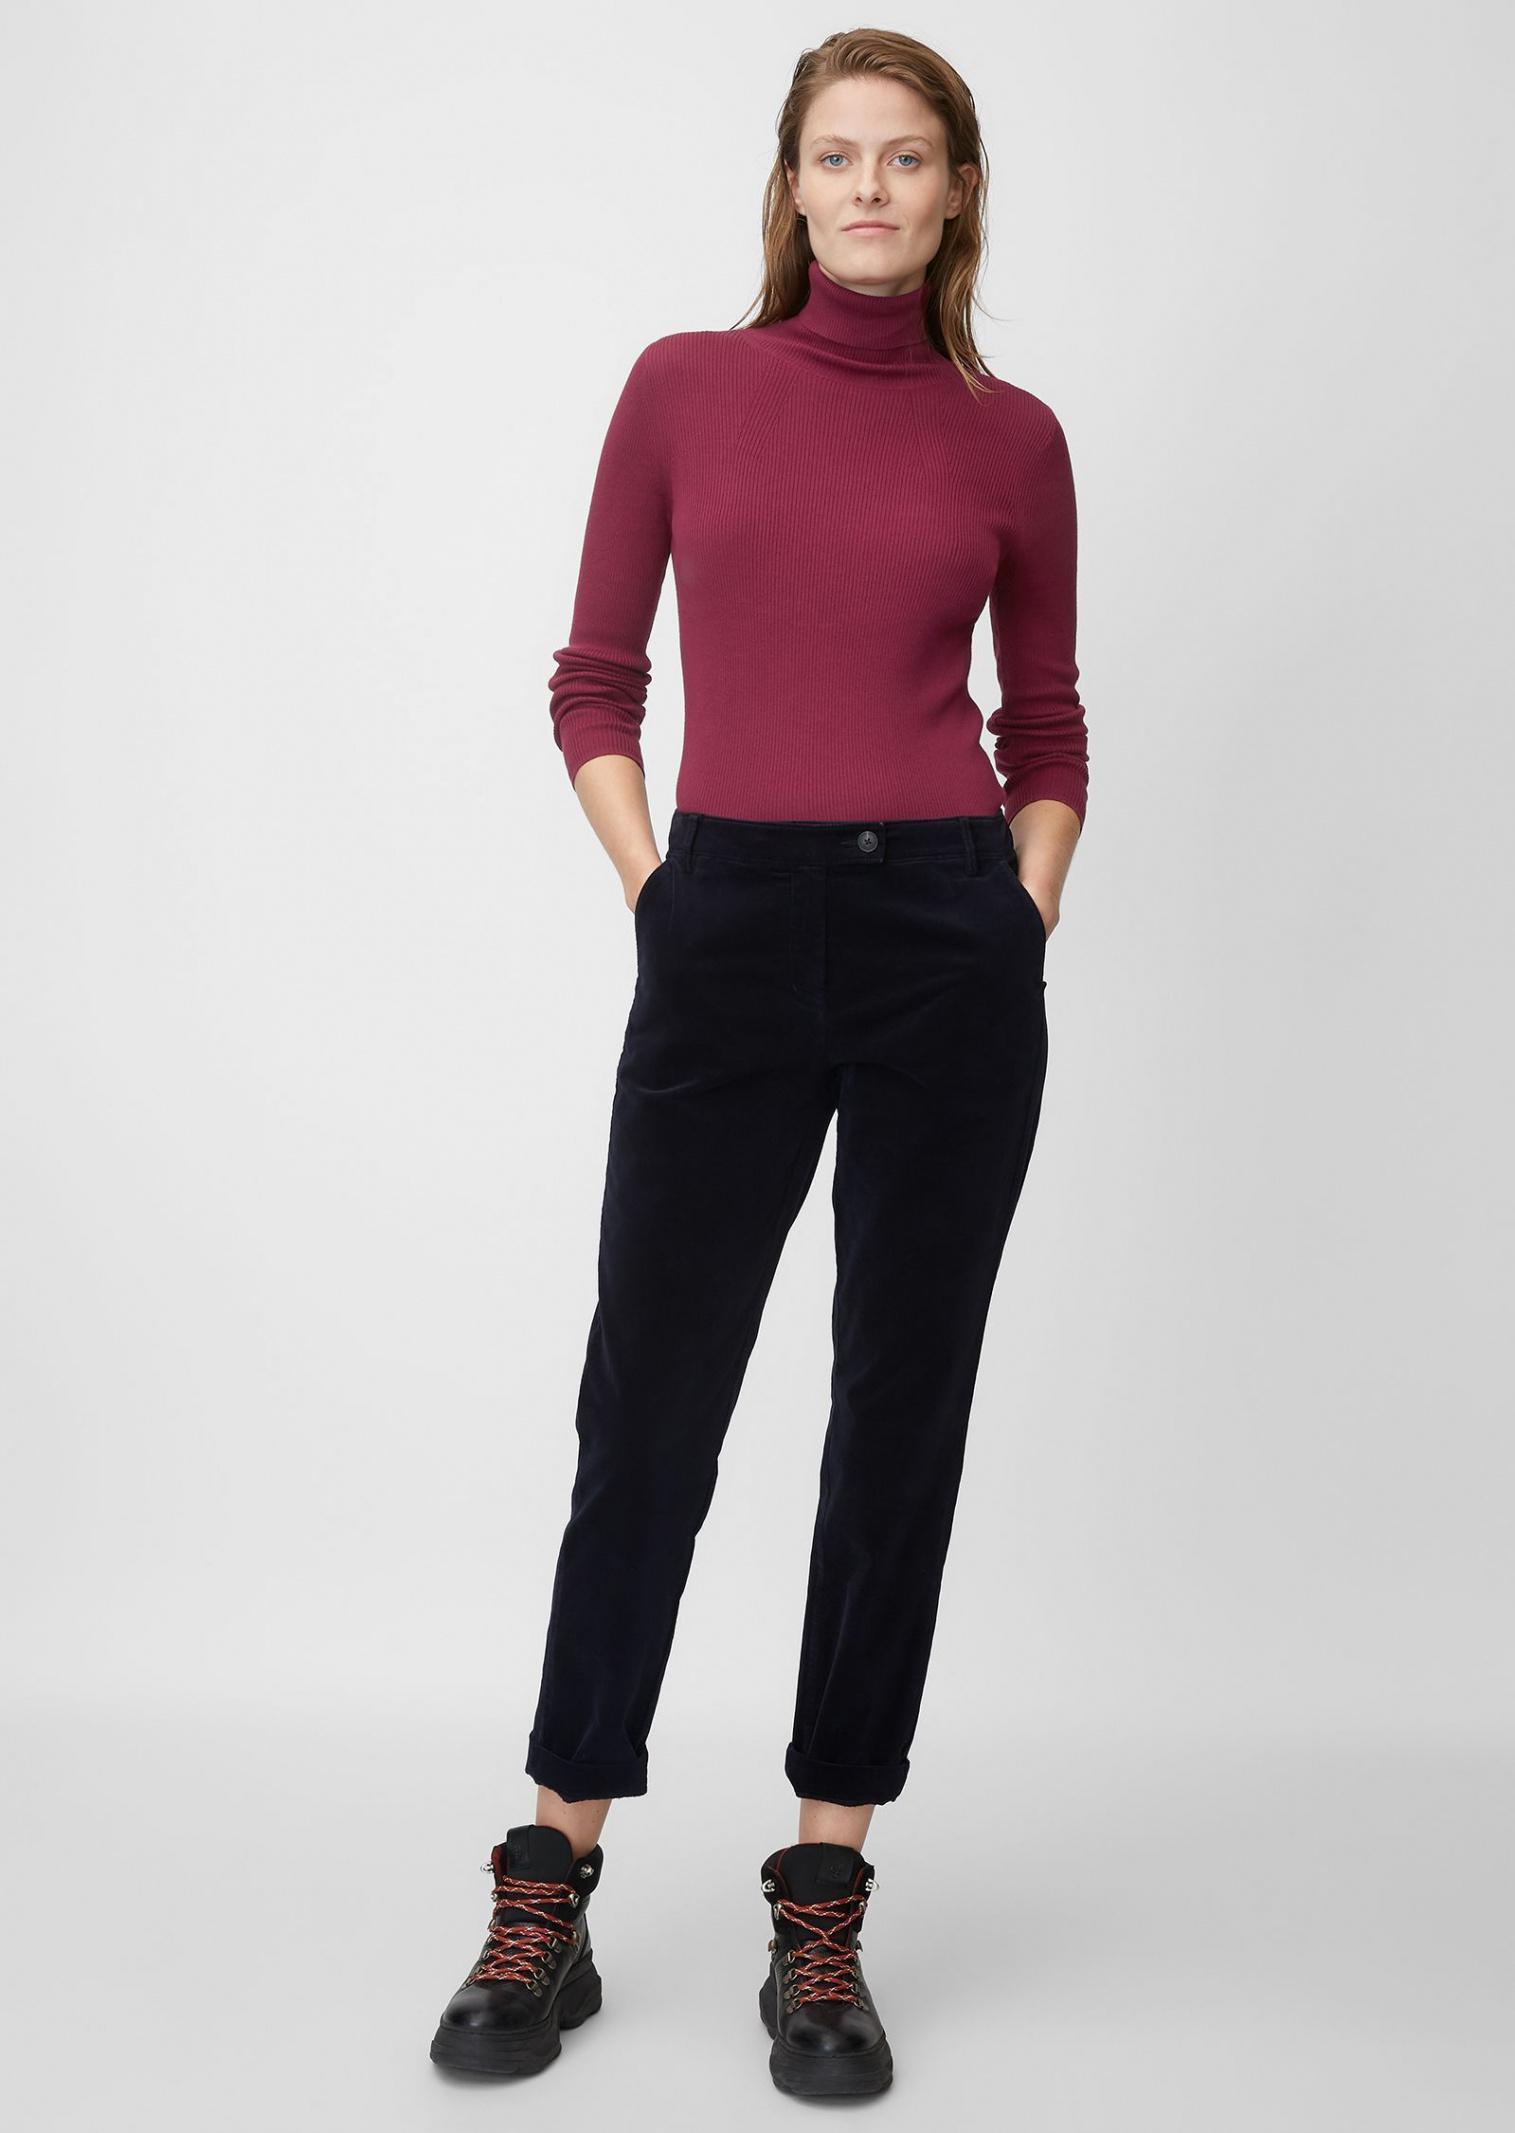 Кофты и свитера женские MARC O'POLO модель PF3860 приобрести, 2017